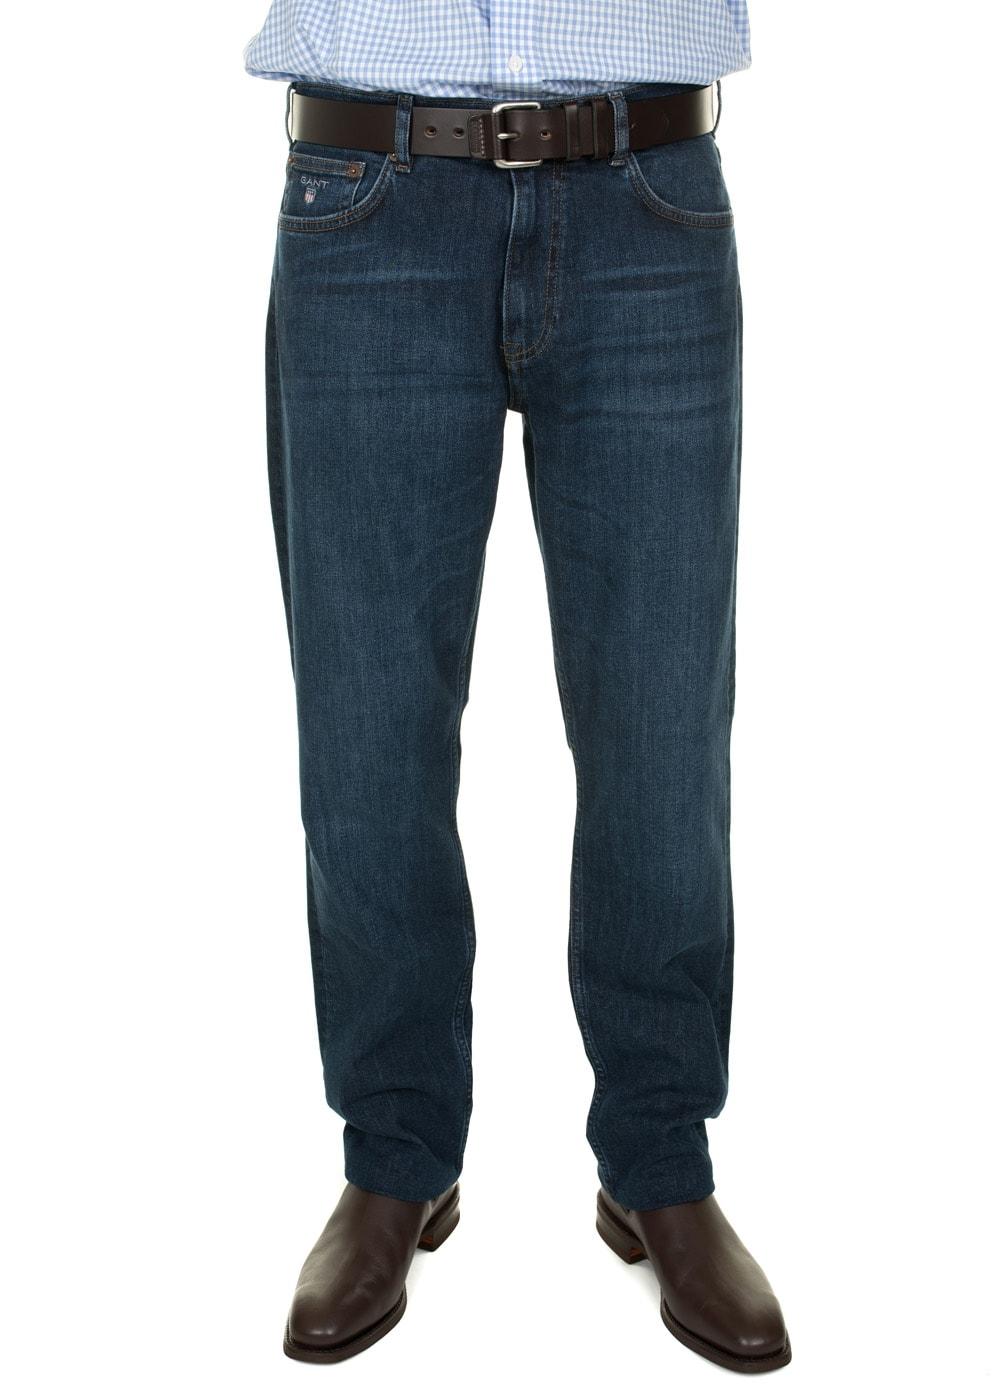 380122021 Gant Regular Gant Jean - Mens from A Hume UK